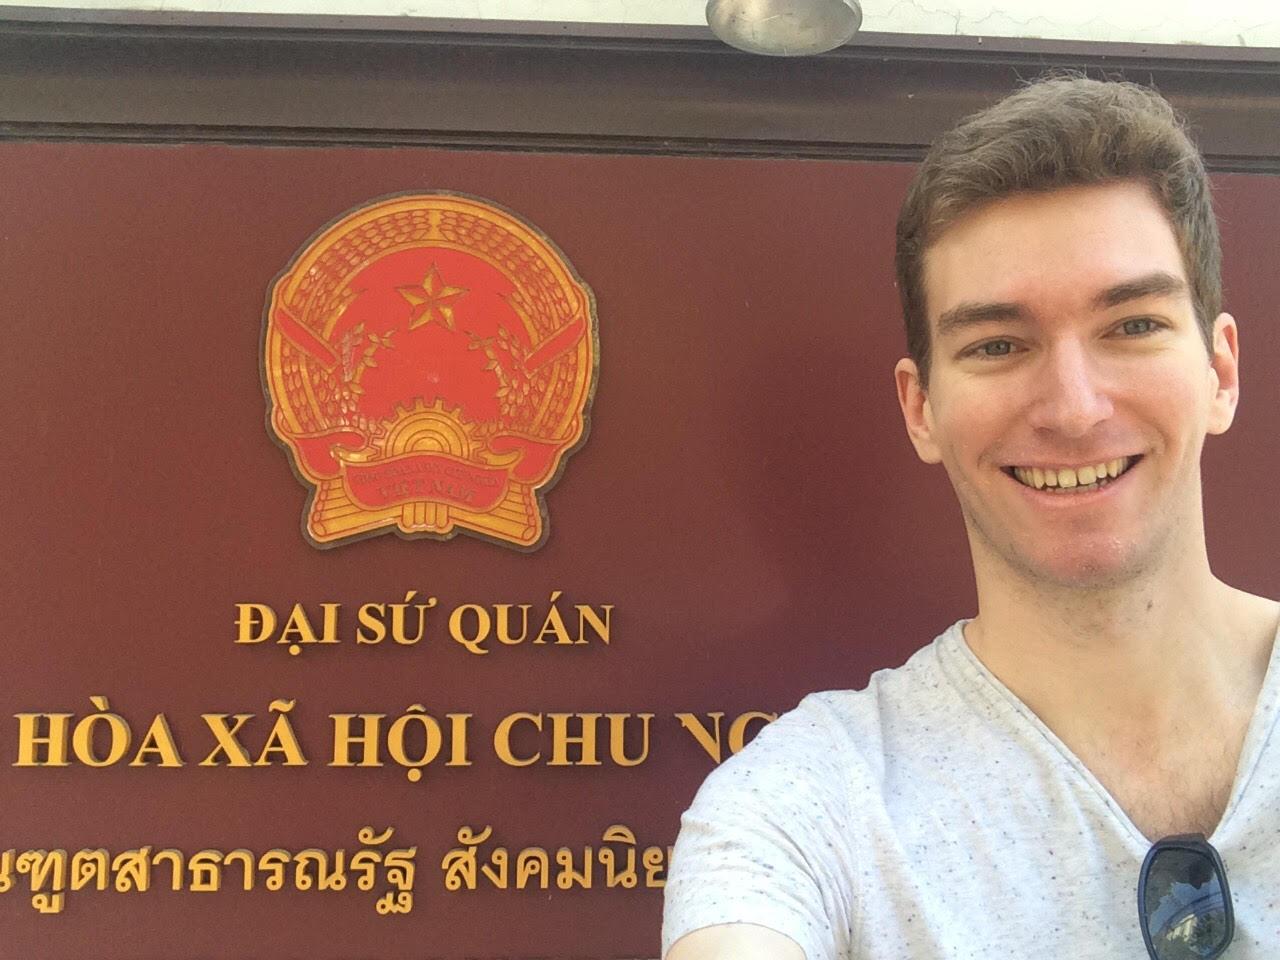 Elliott Killian ElliottKillian in front of the Vietnamese Embassy in Bangkok Thailand. The sign is in Vietnamese and in Thai.